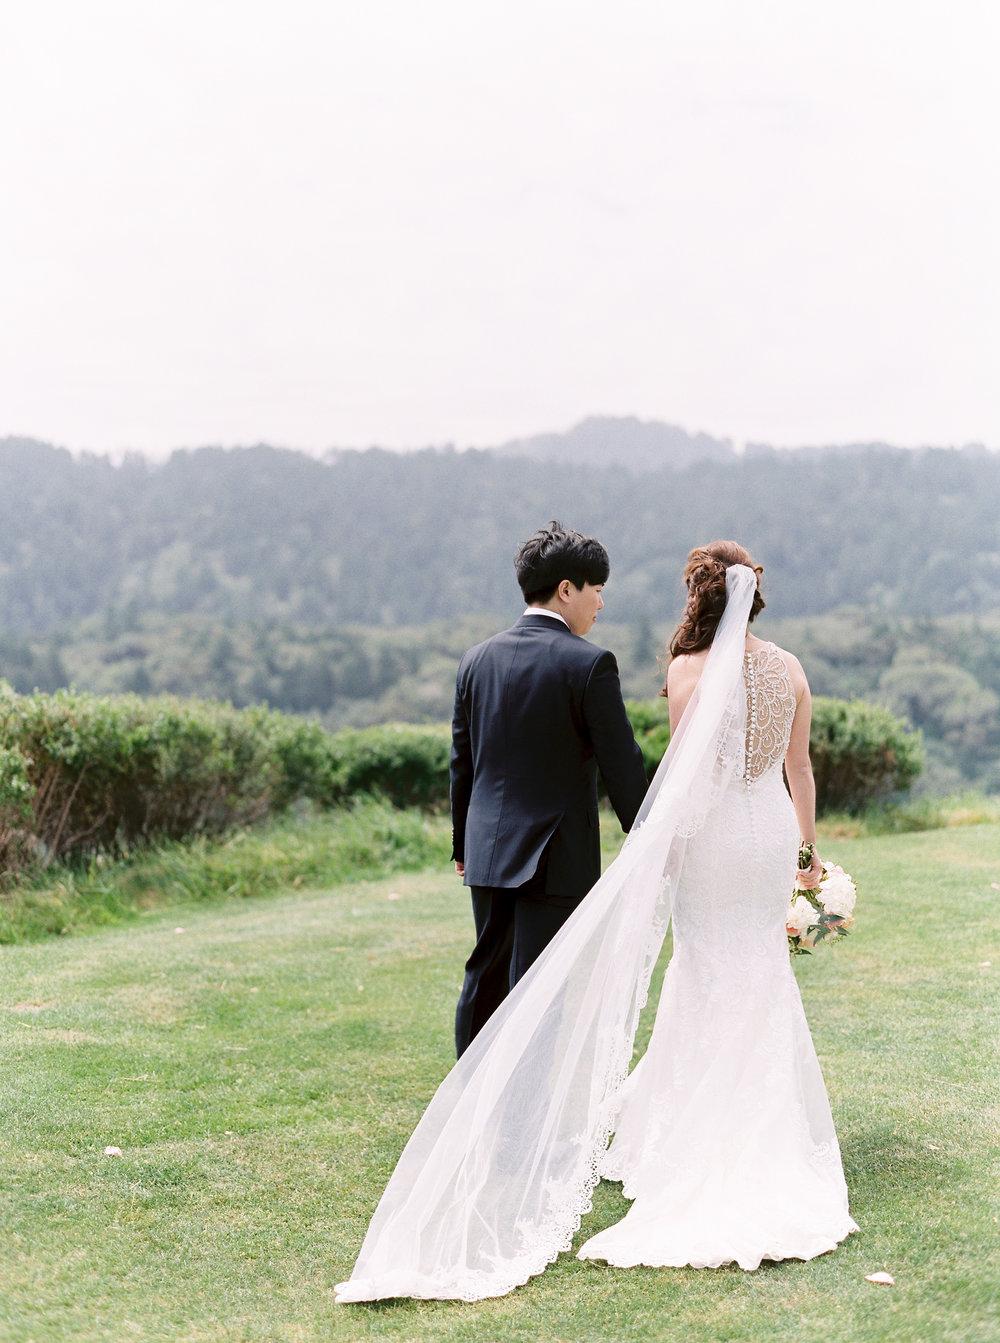 mountaintop-wedding-at-crystal-springs-burlingame-california-43.jpg